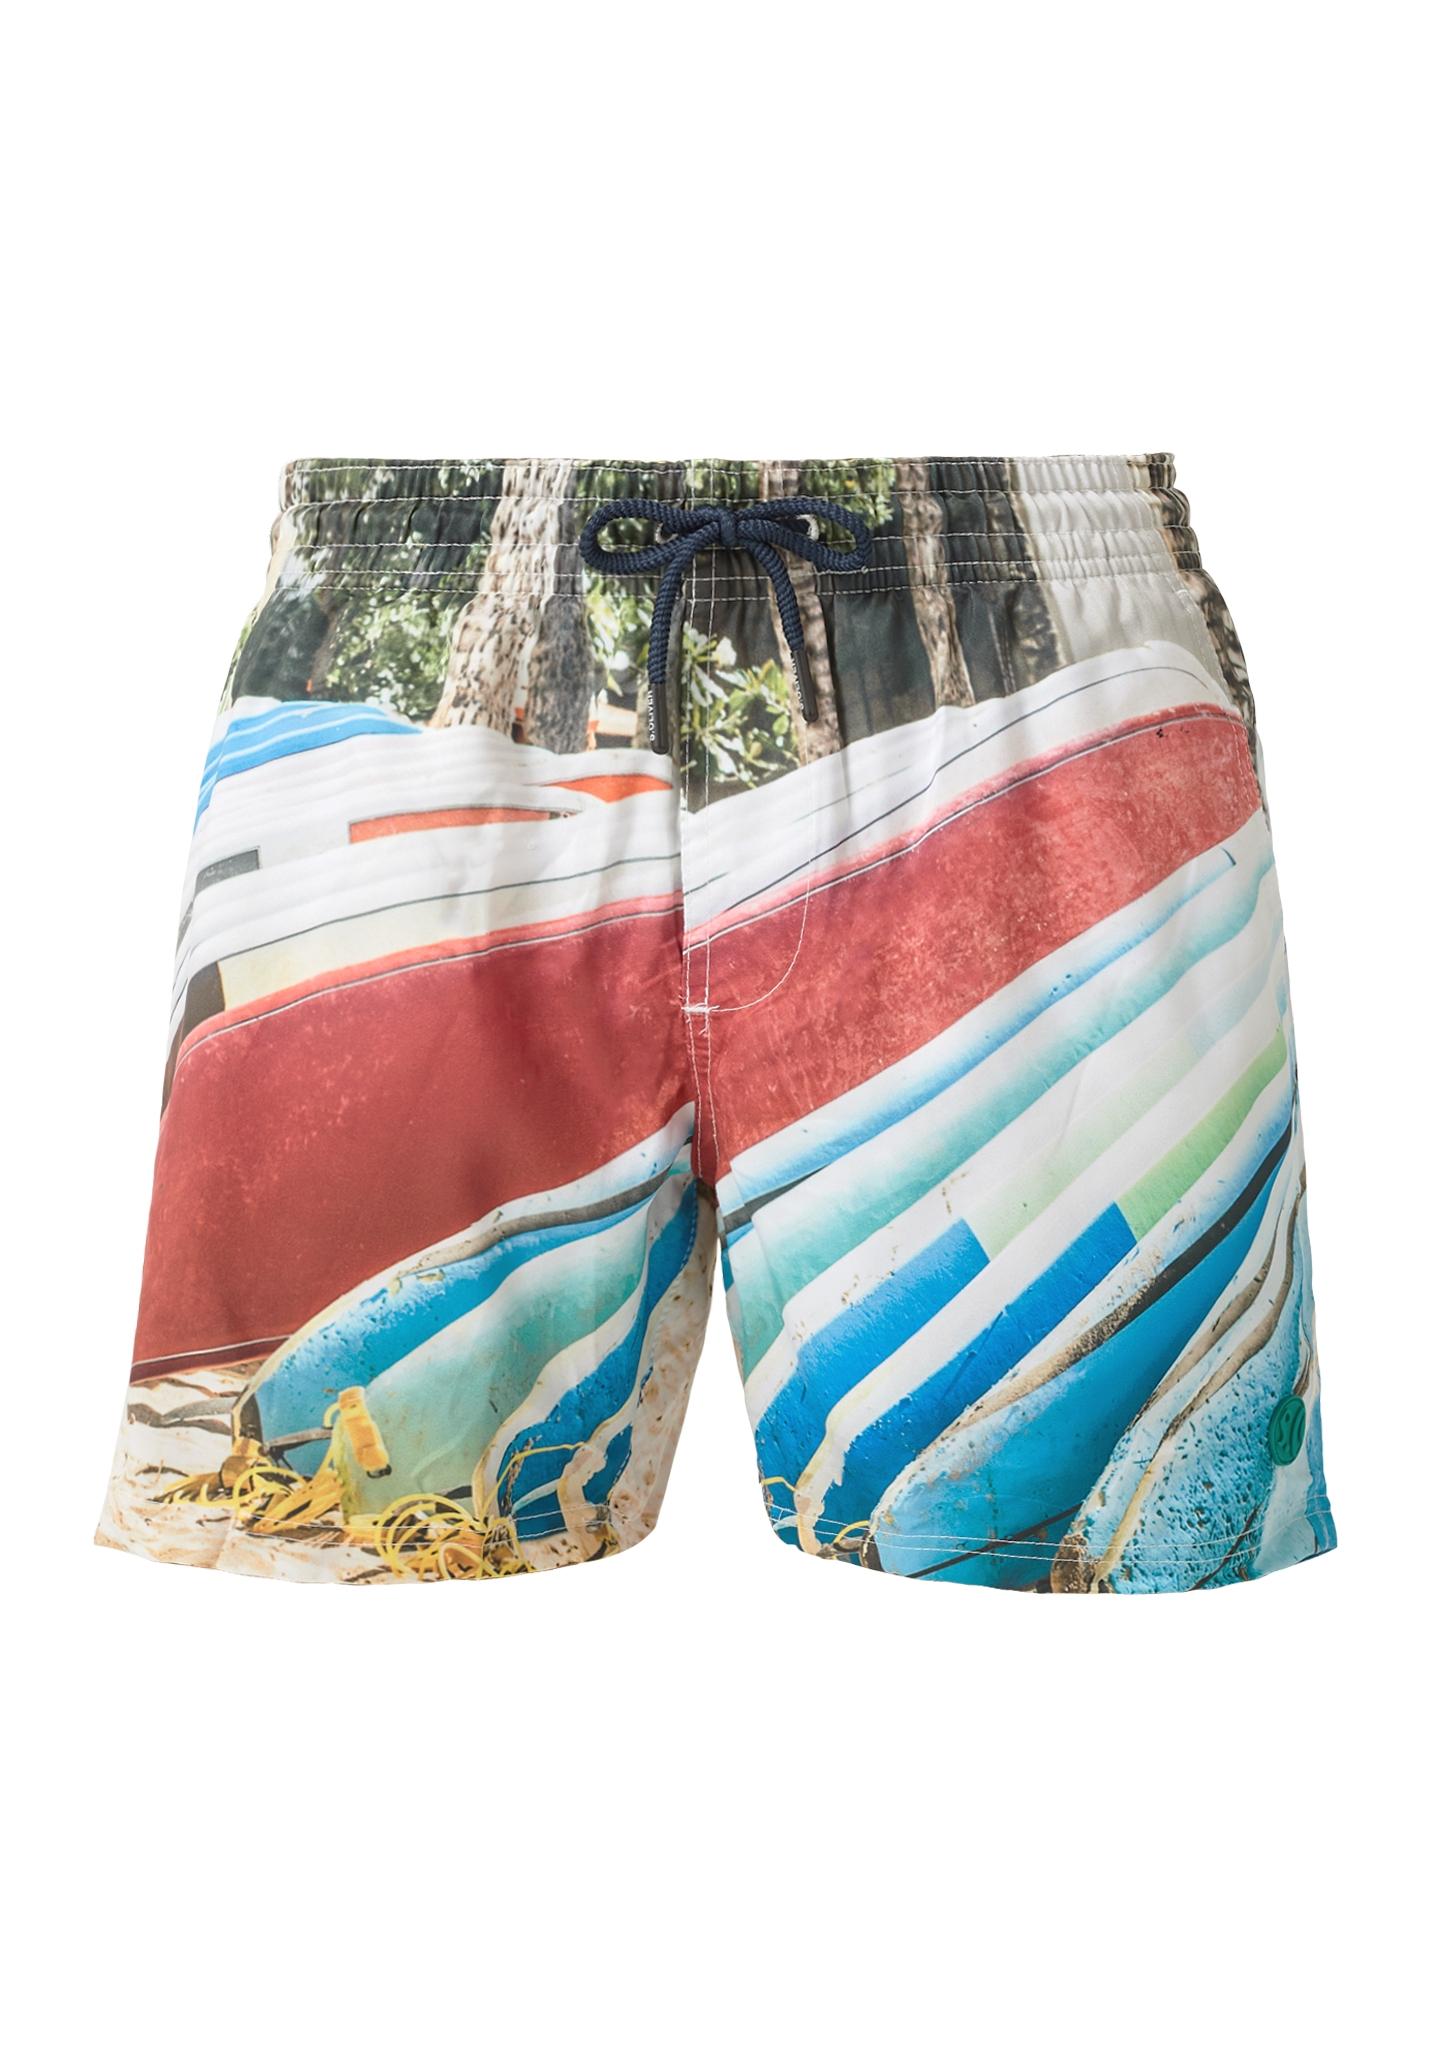 Badehose | Bekleidung > Bademode > Badehosen | Weiß | Oberstoff: 100% polyester| futter: 100% polyester | s.Oliver